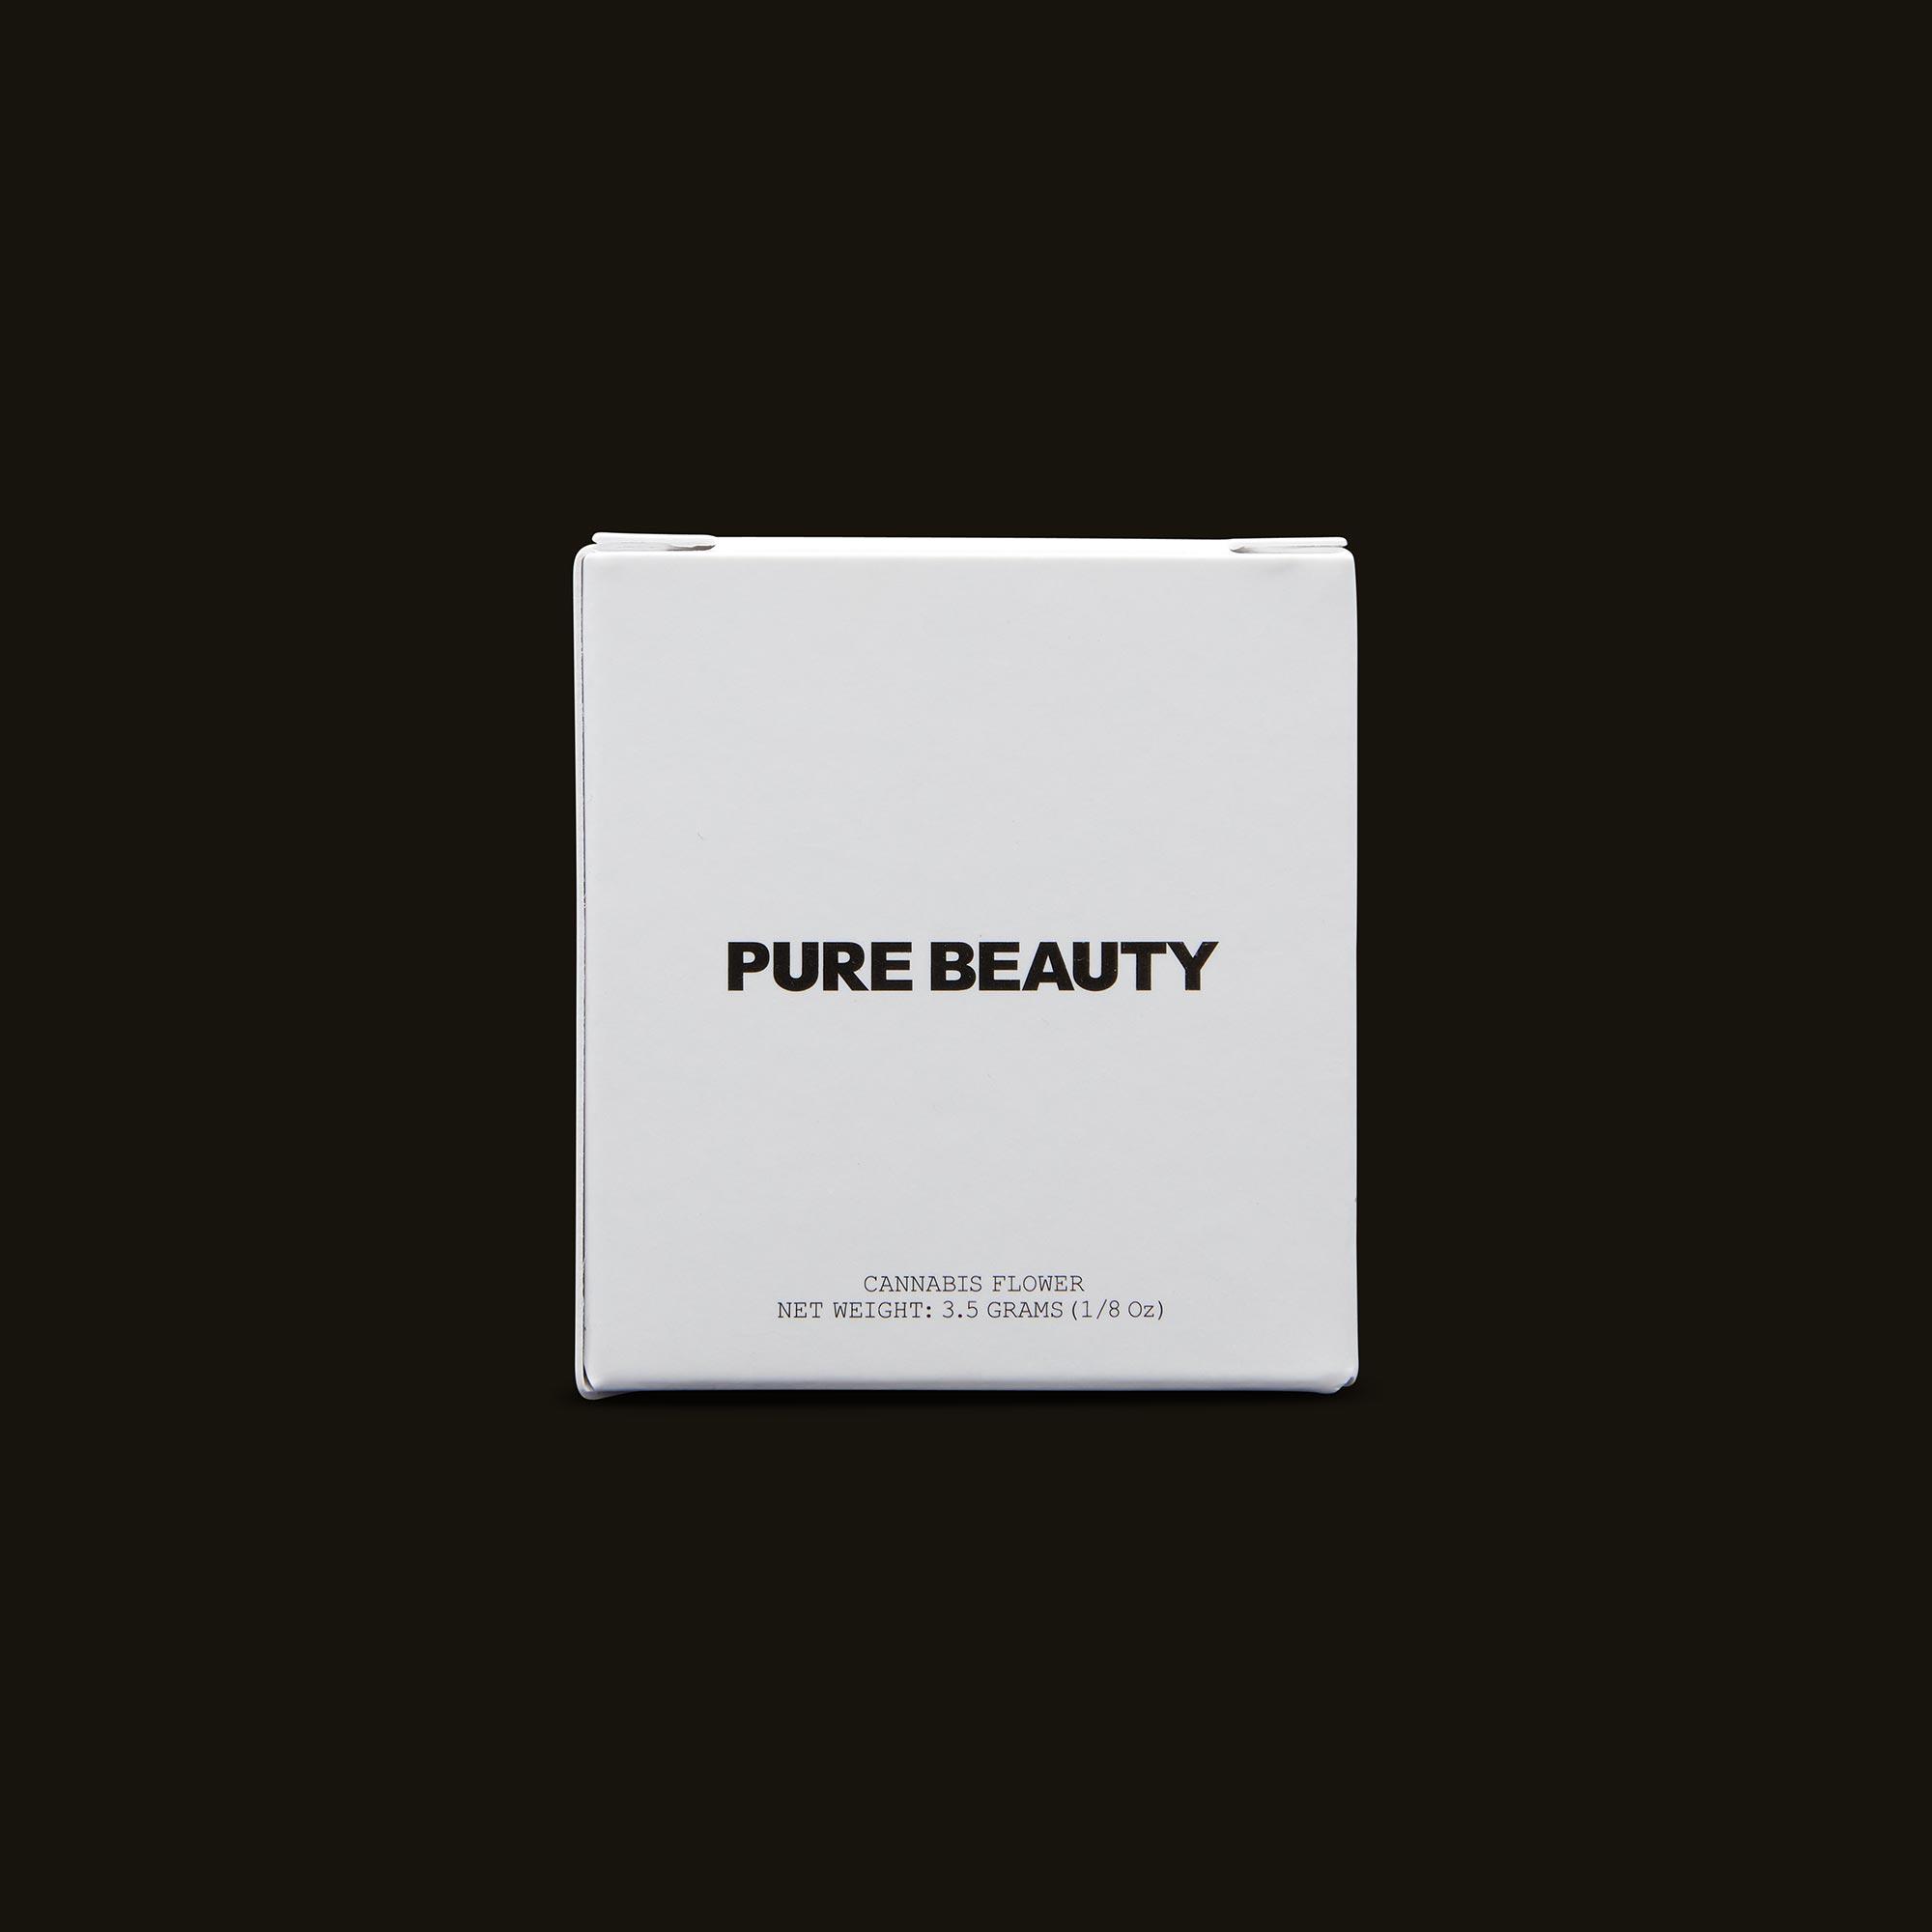 Pure Beauty Harlequin x GDP Box